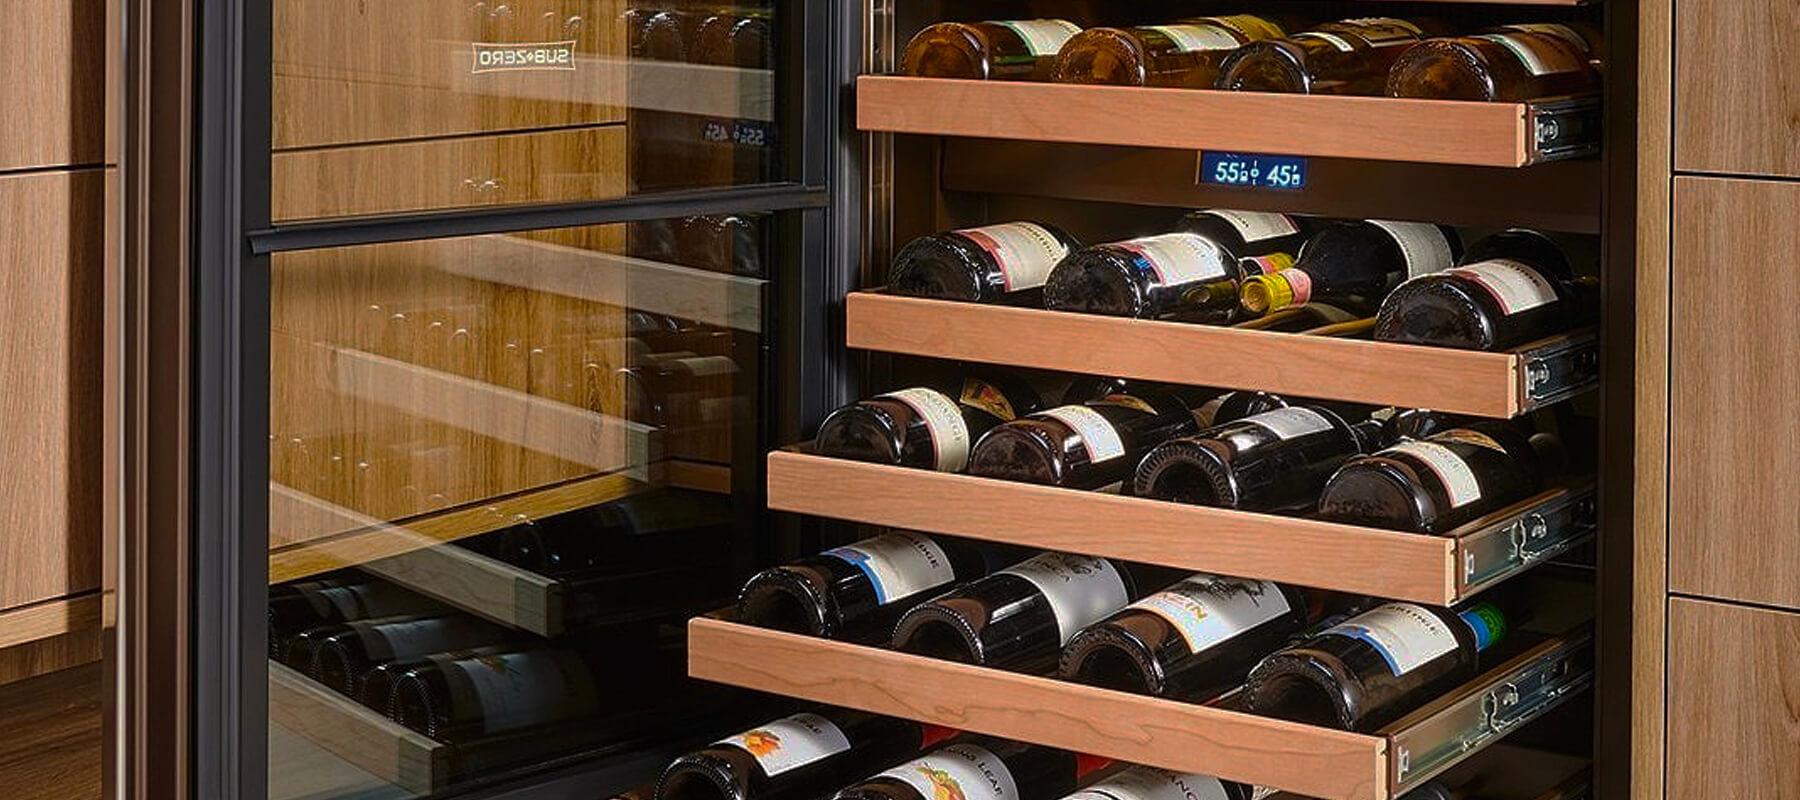 Built in Wine Refrigerator Undercounter Playa Vista | Built-in Refrigerator Repair